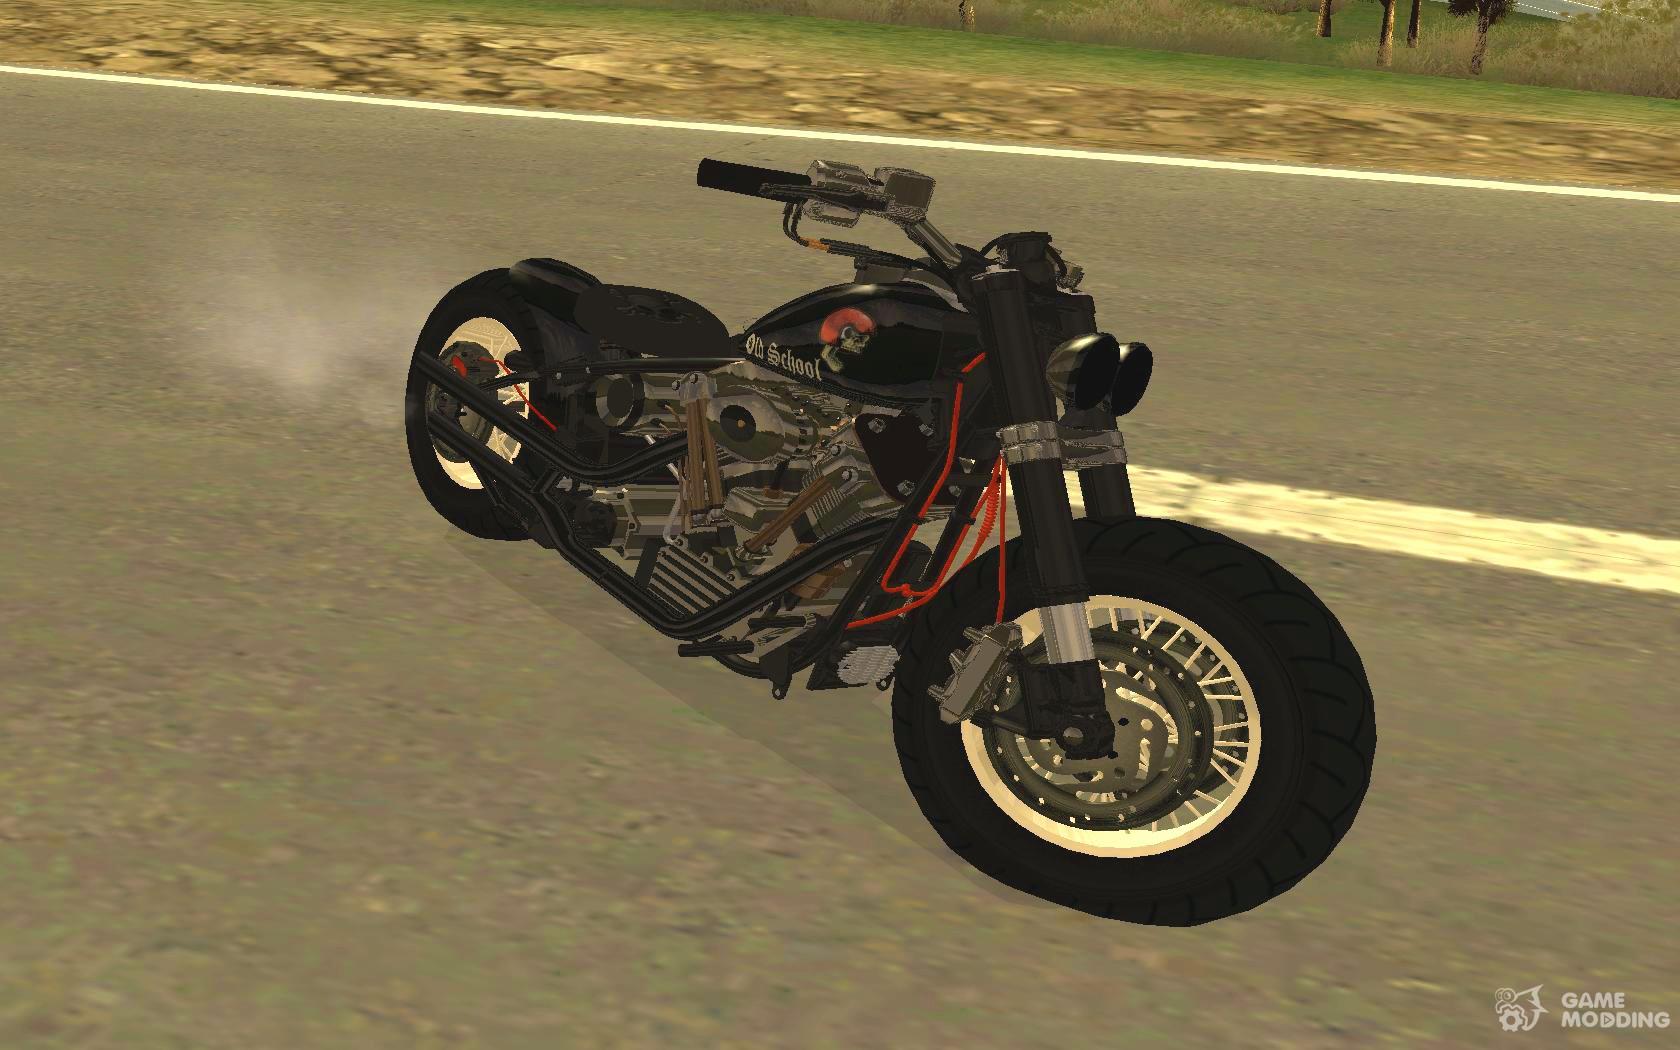 100 harley davidson motorcycles in san harley for for Mercedes benz c550 for sale